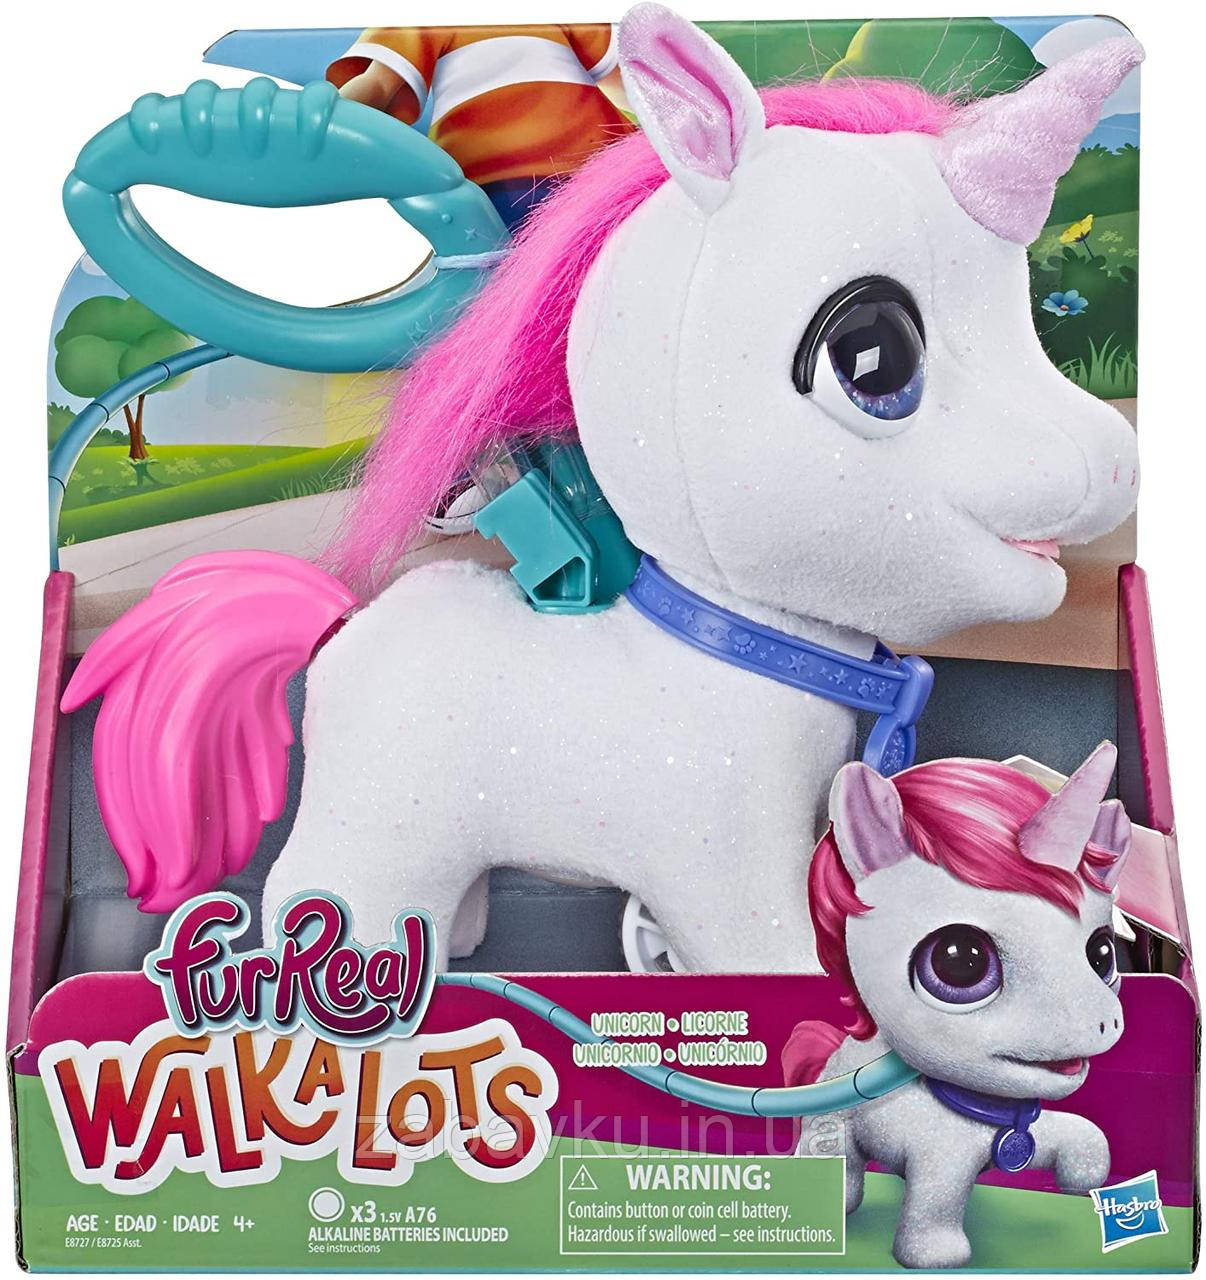 FurReal Walkalots Big Wags Unicorn  Hasbro интерактивный единорог фурриал на поводке